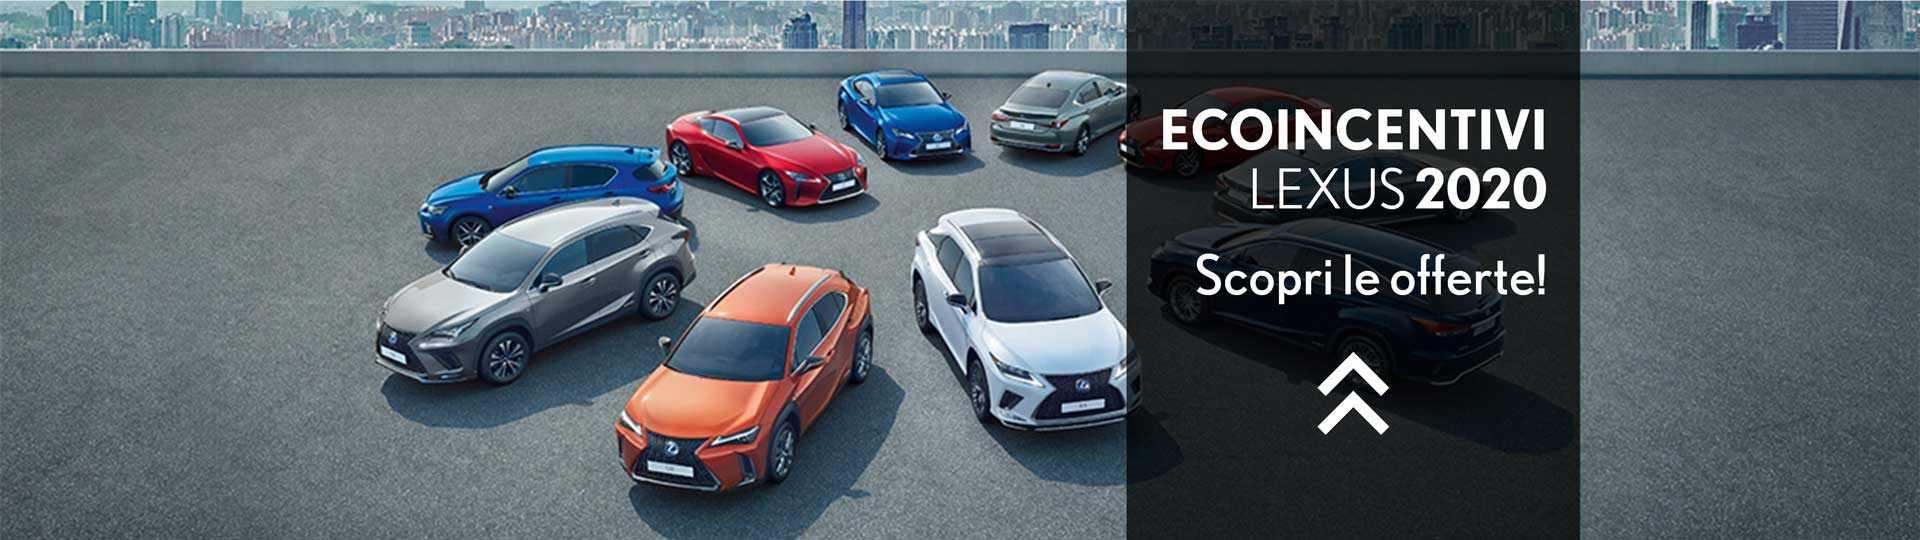 Ecoincentivi-Lexus_sito-min.jpg